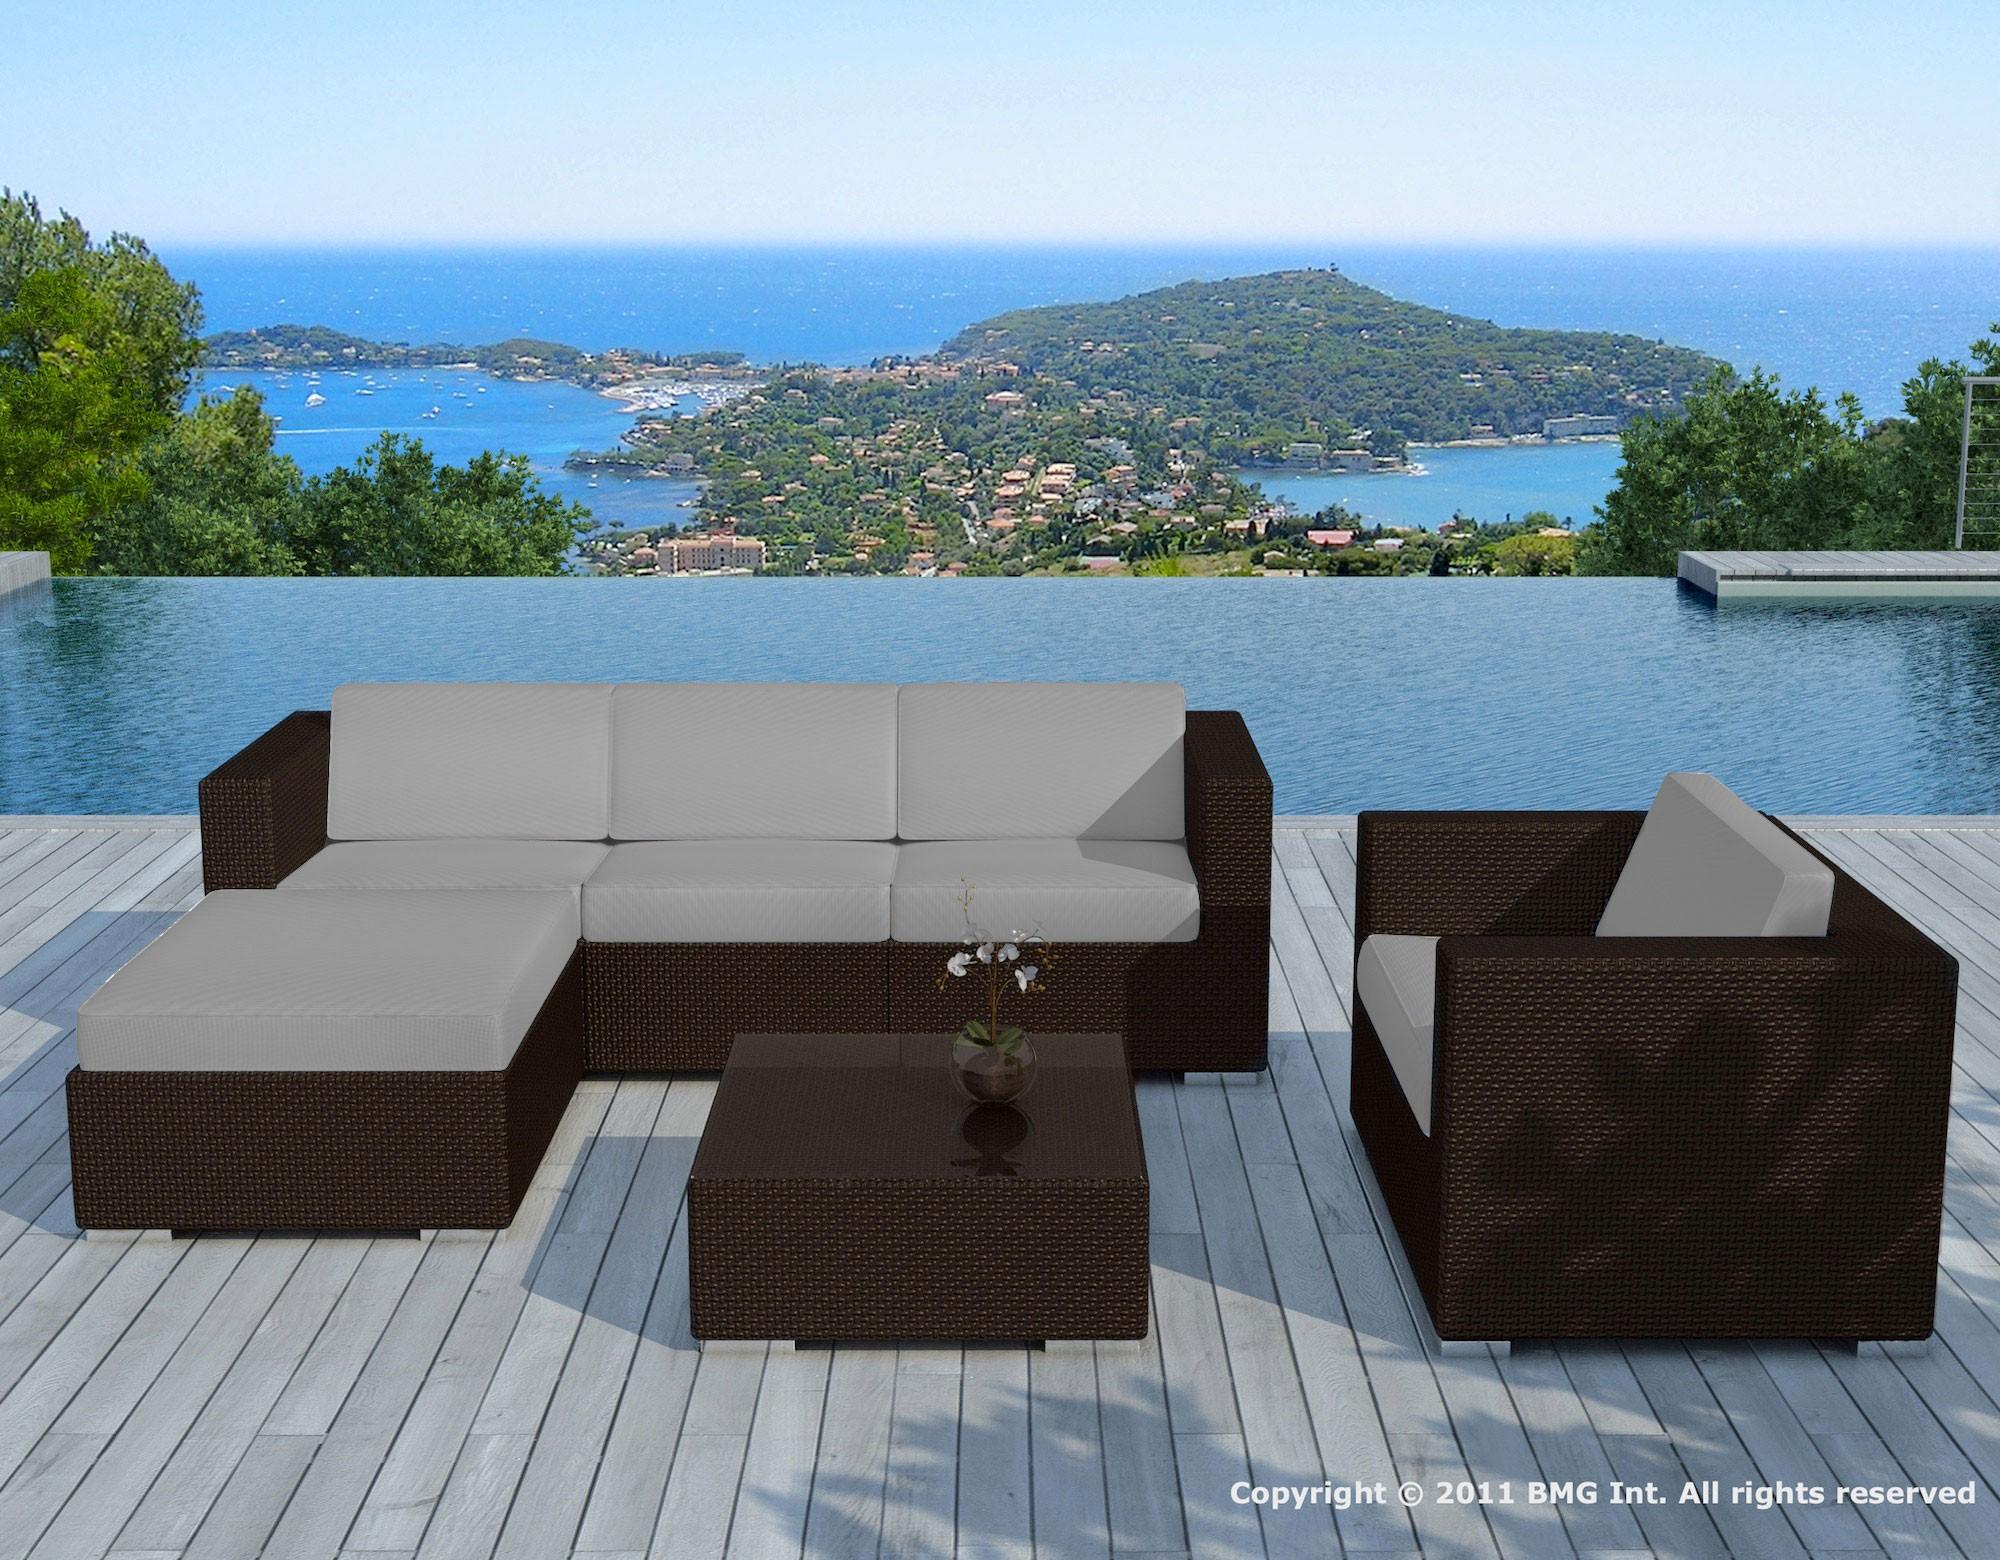 Salon De Jardin Resine Chocolat/gris - Copacabana - Delorm Design dedans Salon De Jardin En Resine Gris